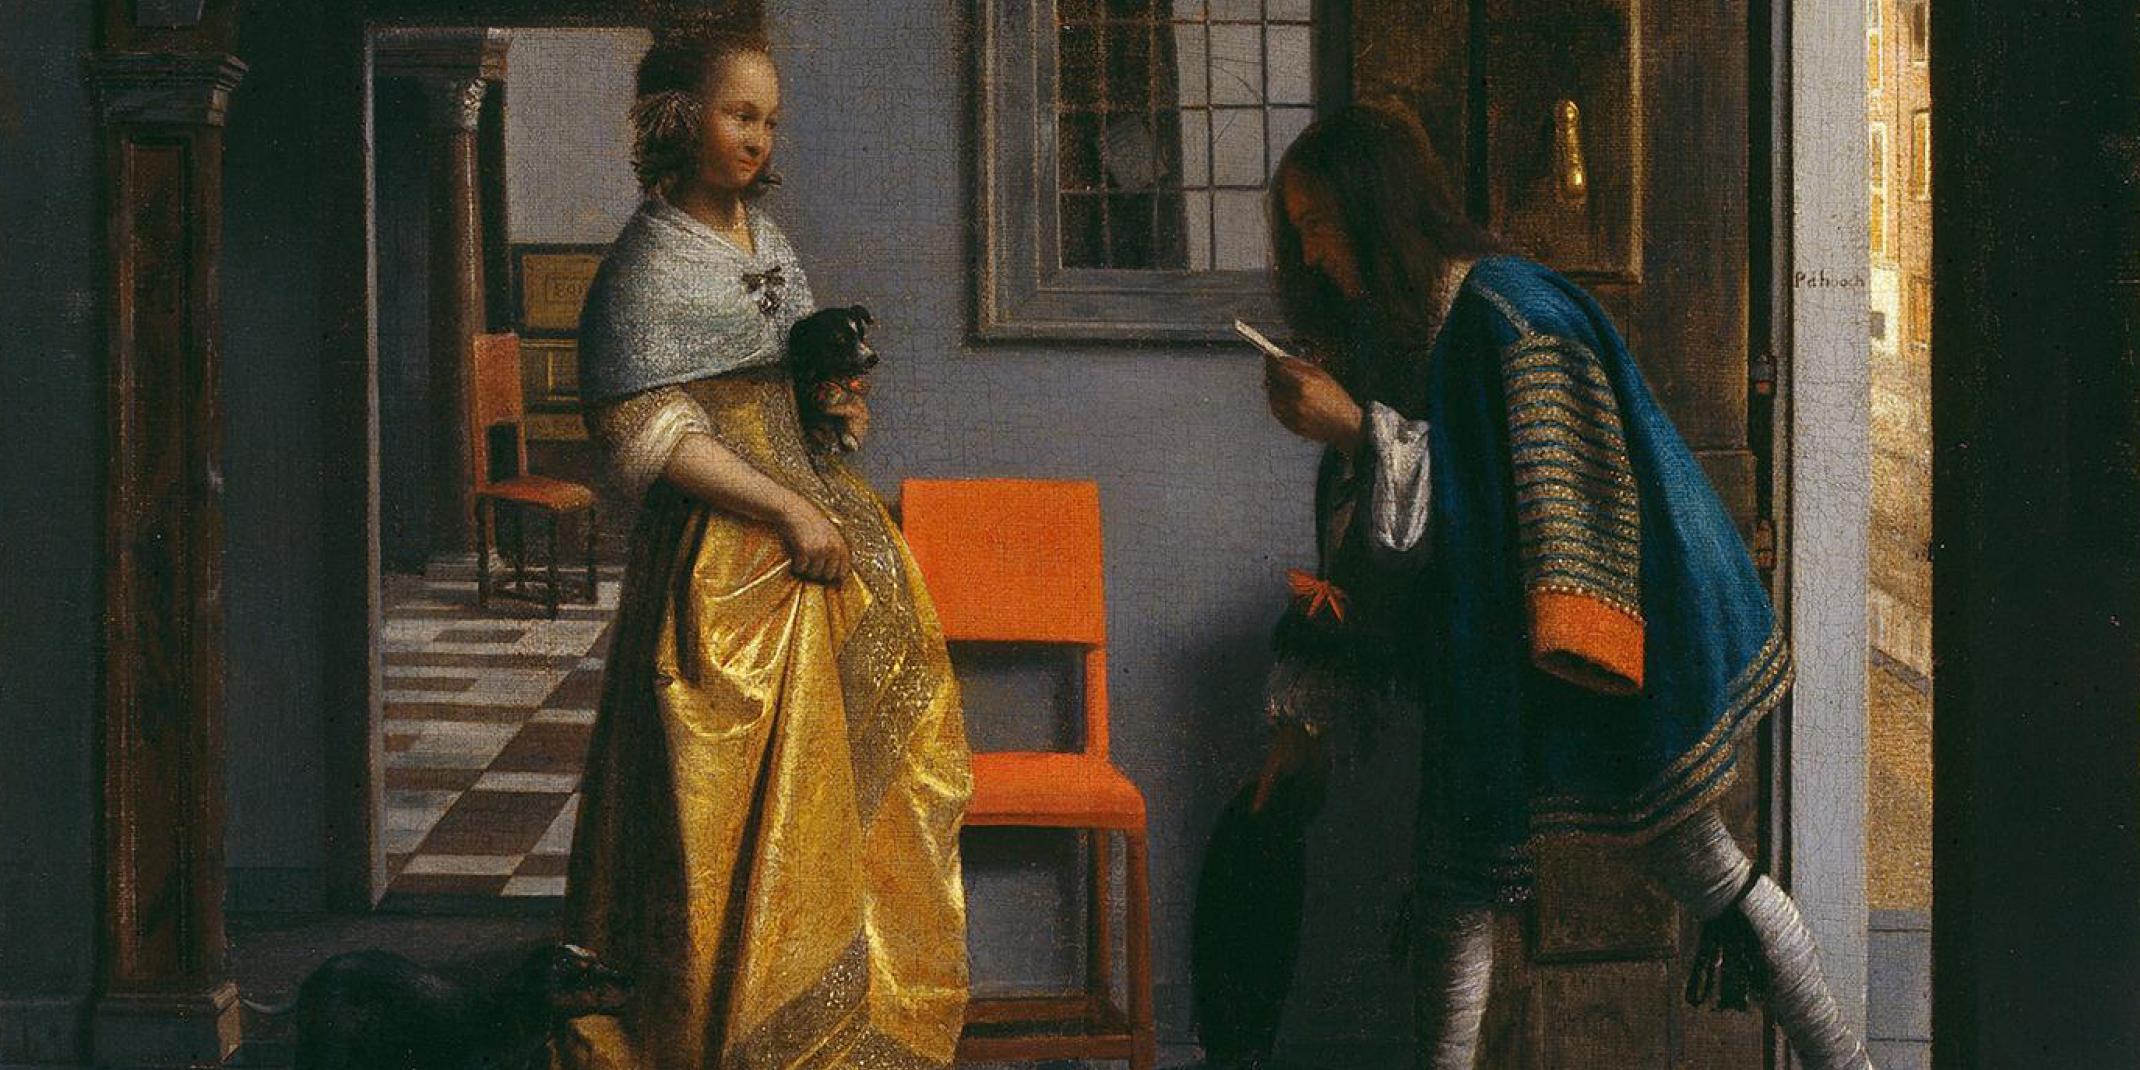 Pieter de Hooch (1629 - 1684) Der Liebesbote, 1670 © Hamburger Kunsthalle / bpk Foto: Elke Walford